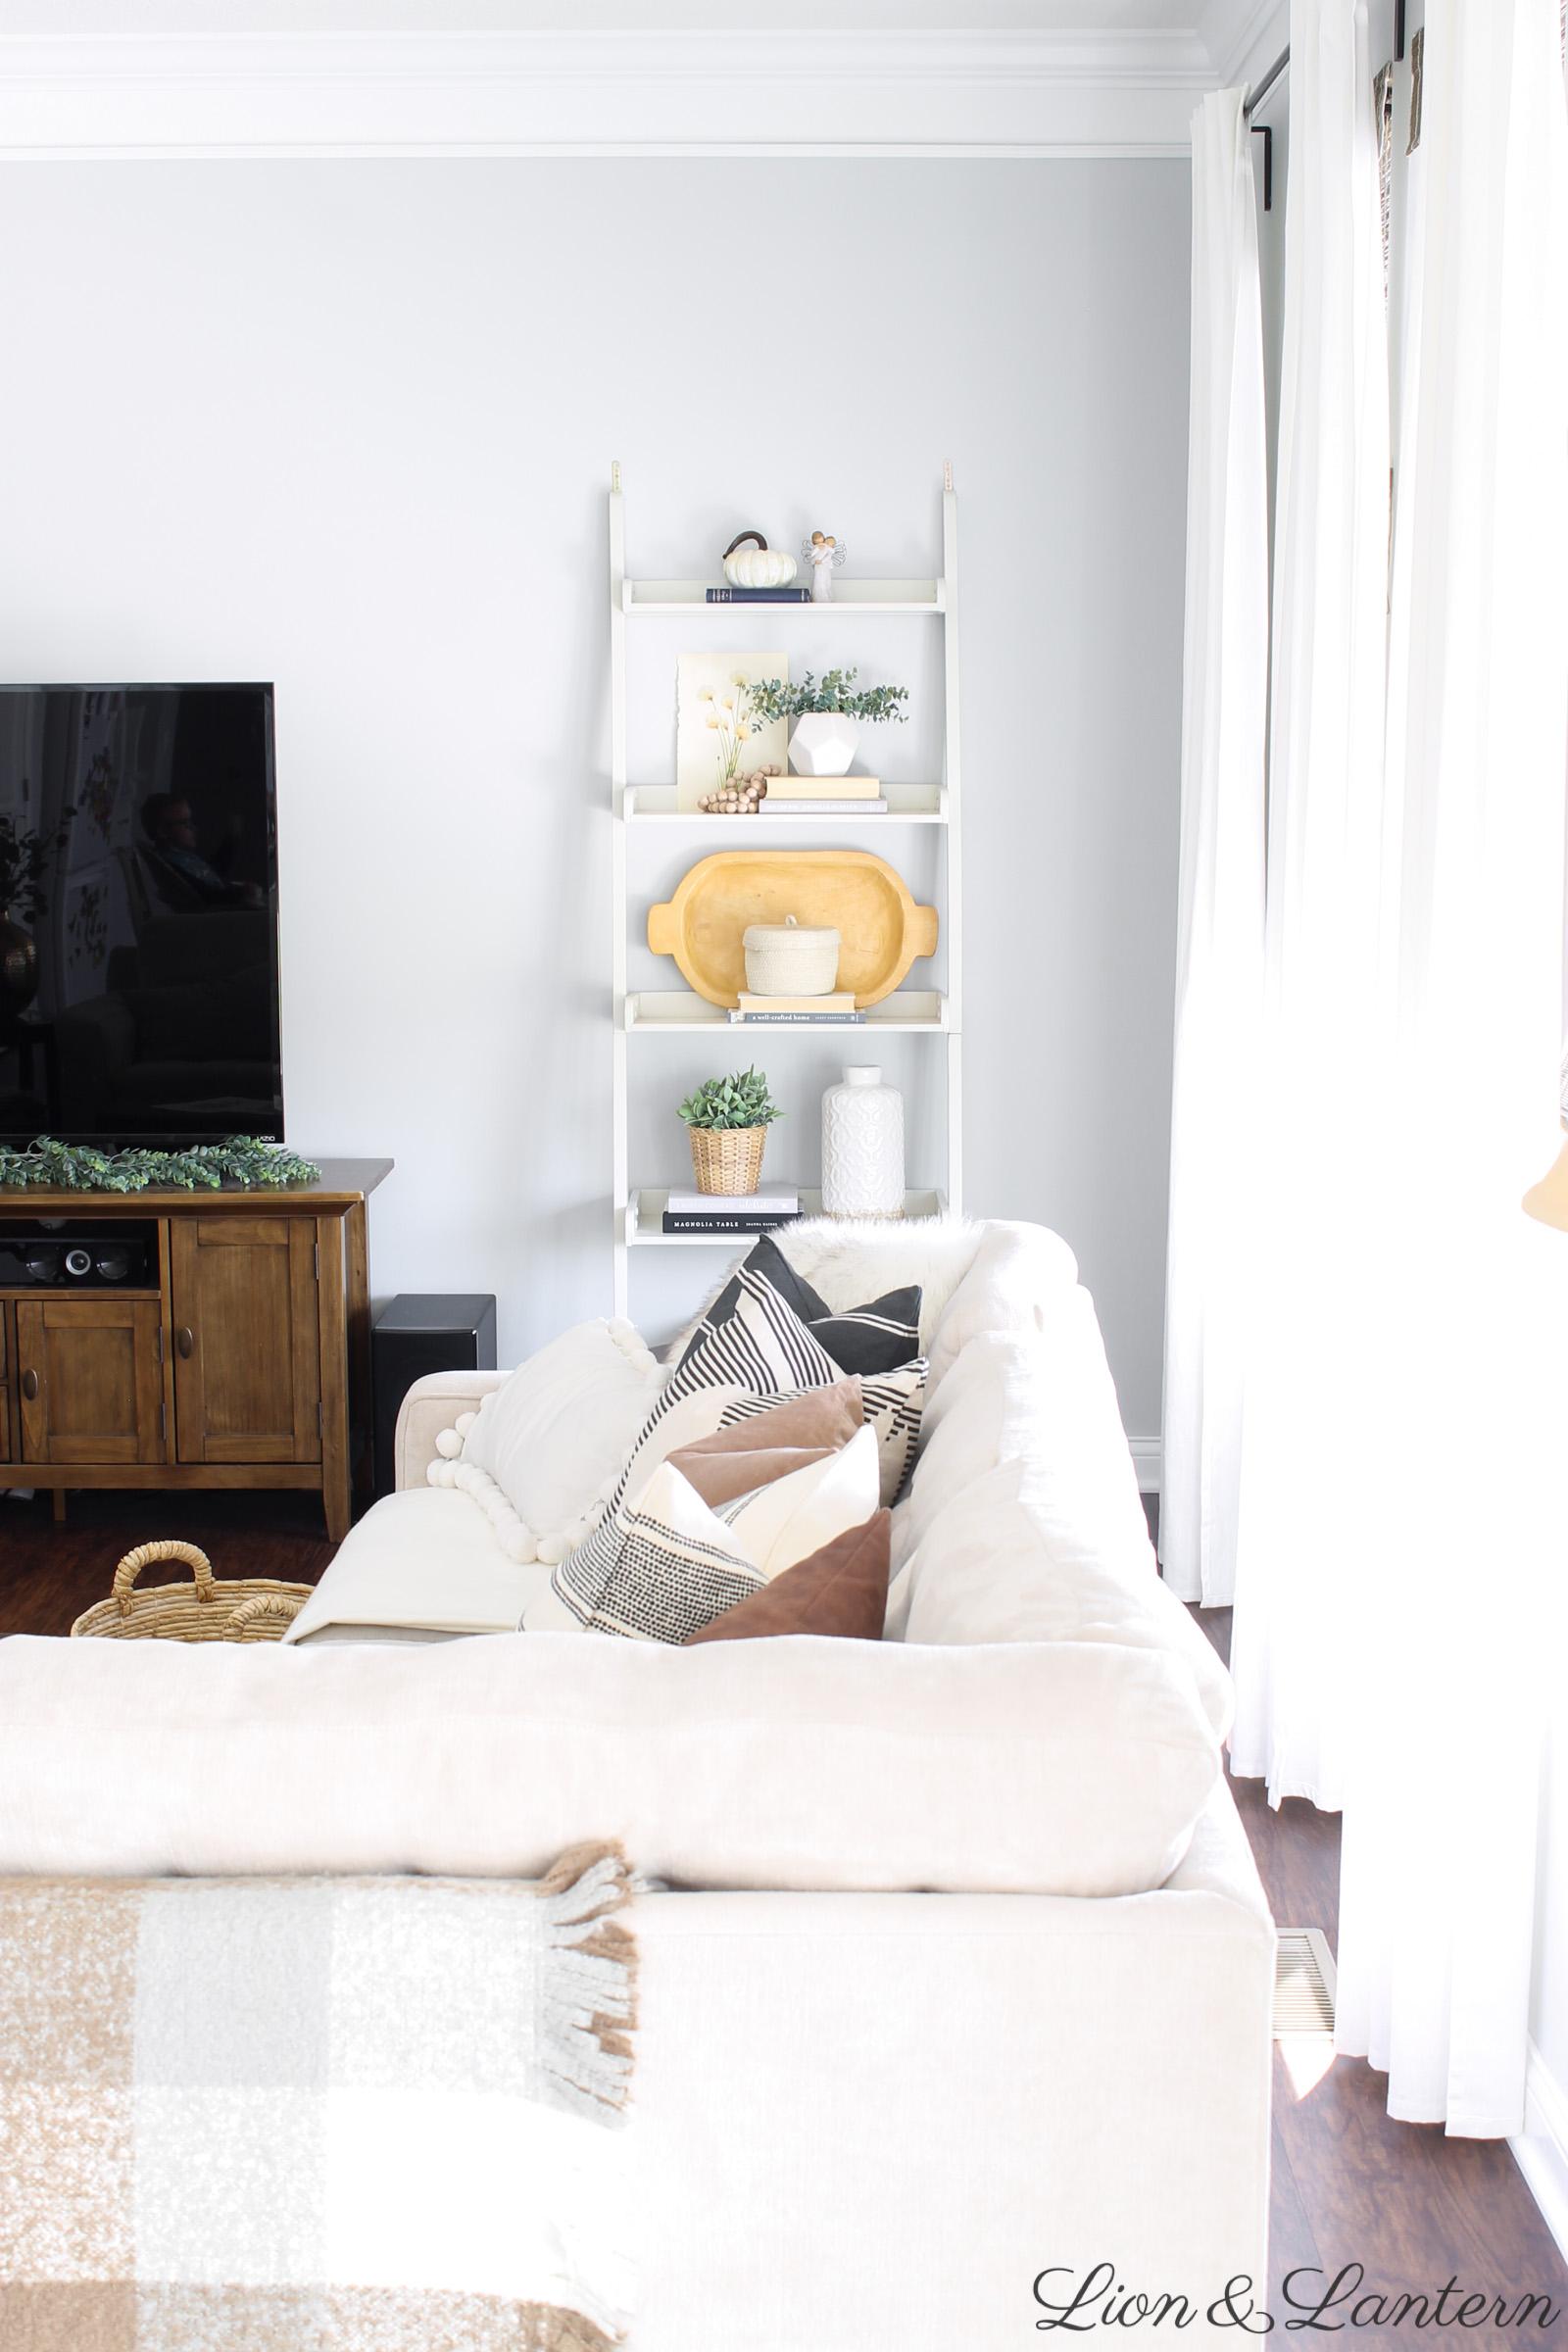 Fall Living Room at LionAndLantern.com | fall shelf styling, autumn decor, fall home decor, fall throw pillows, pillow covers, boho chic, modern farmhouse, ladder shelf